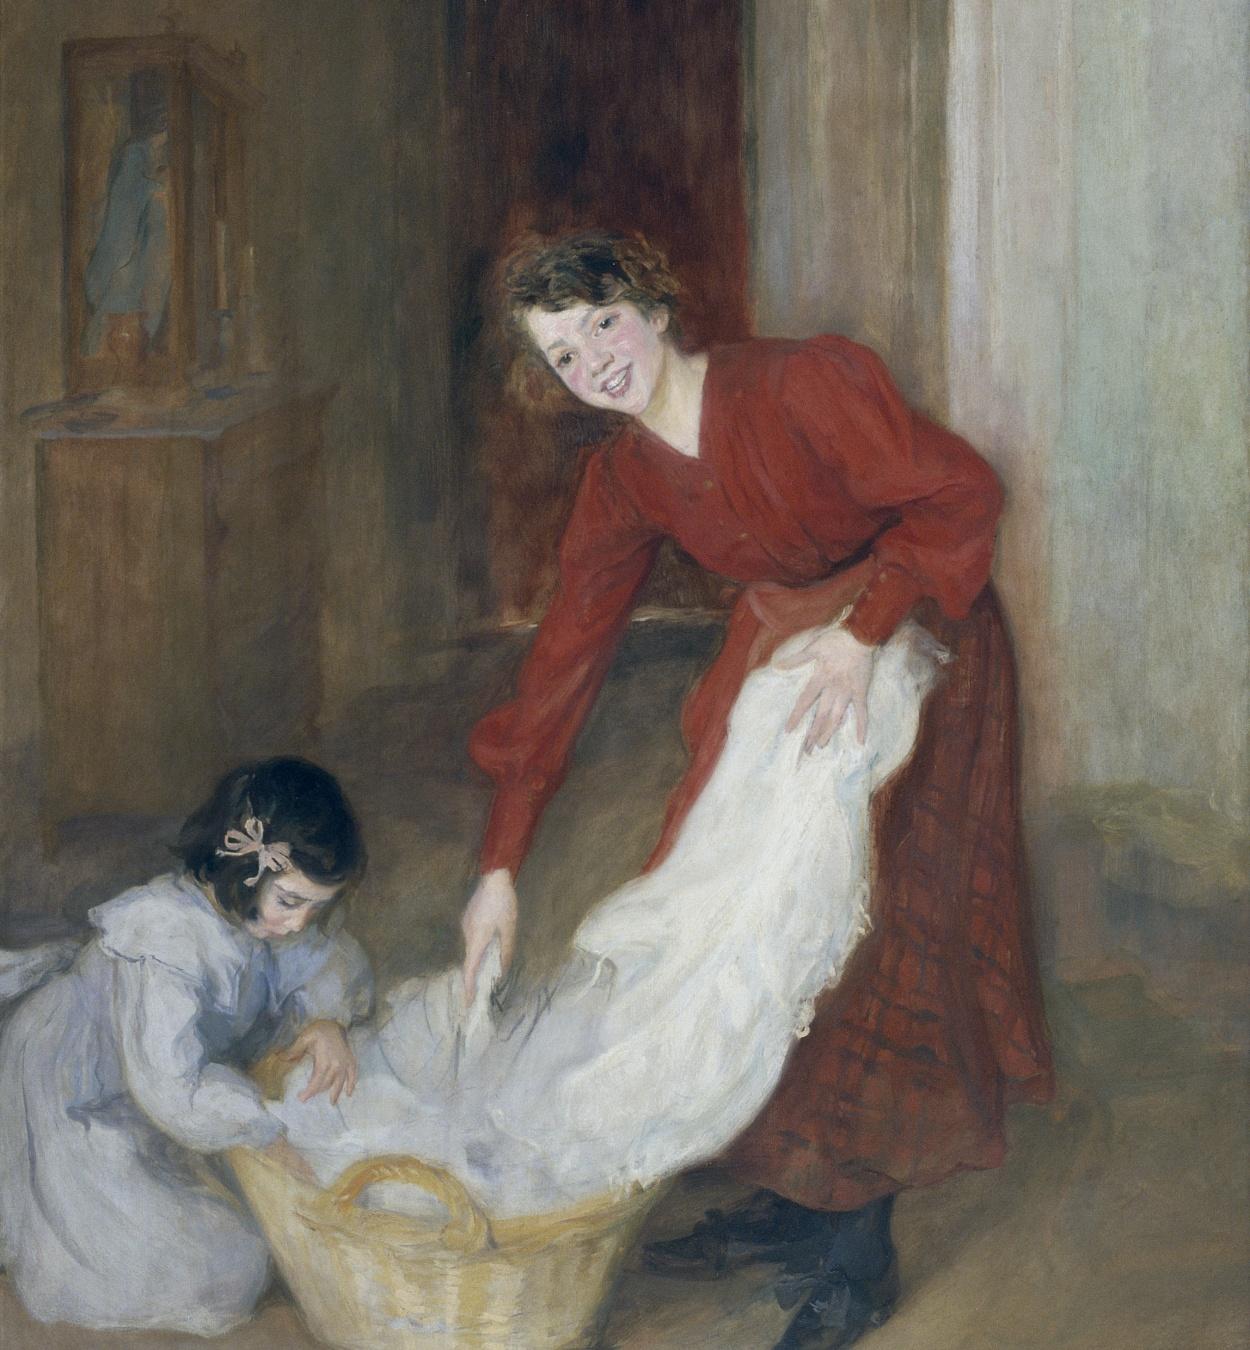 Lluïsa Vidal - Las amas de casa - 1905